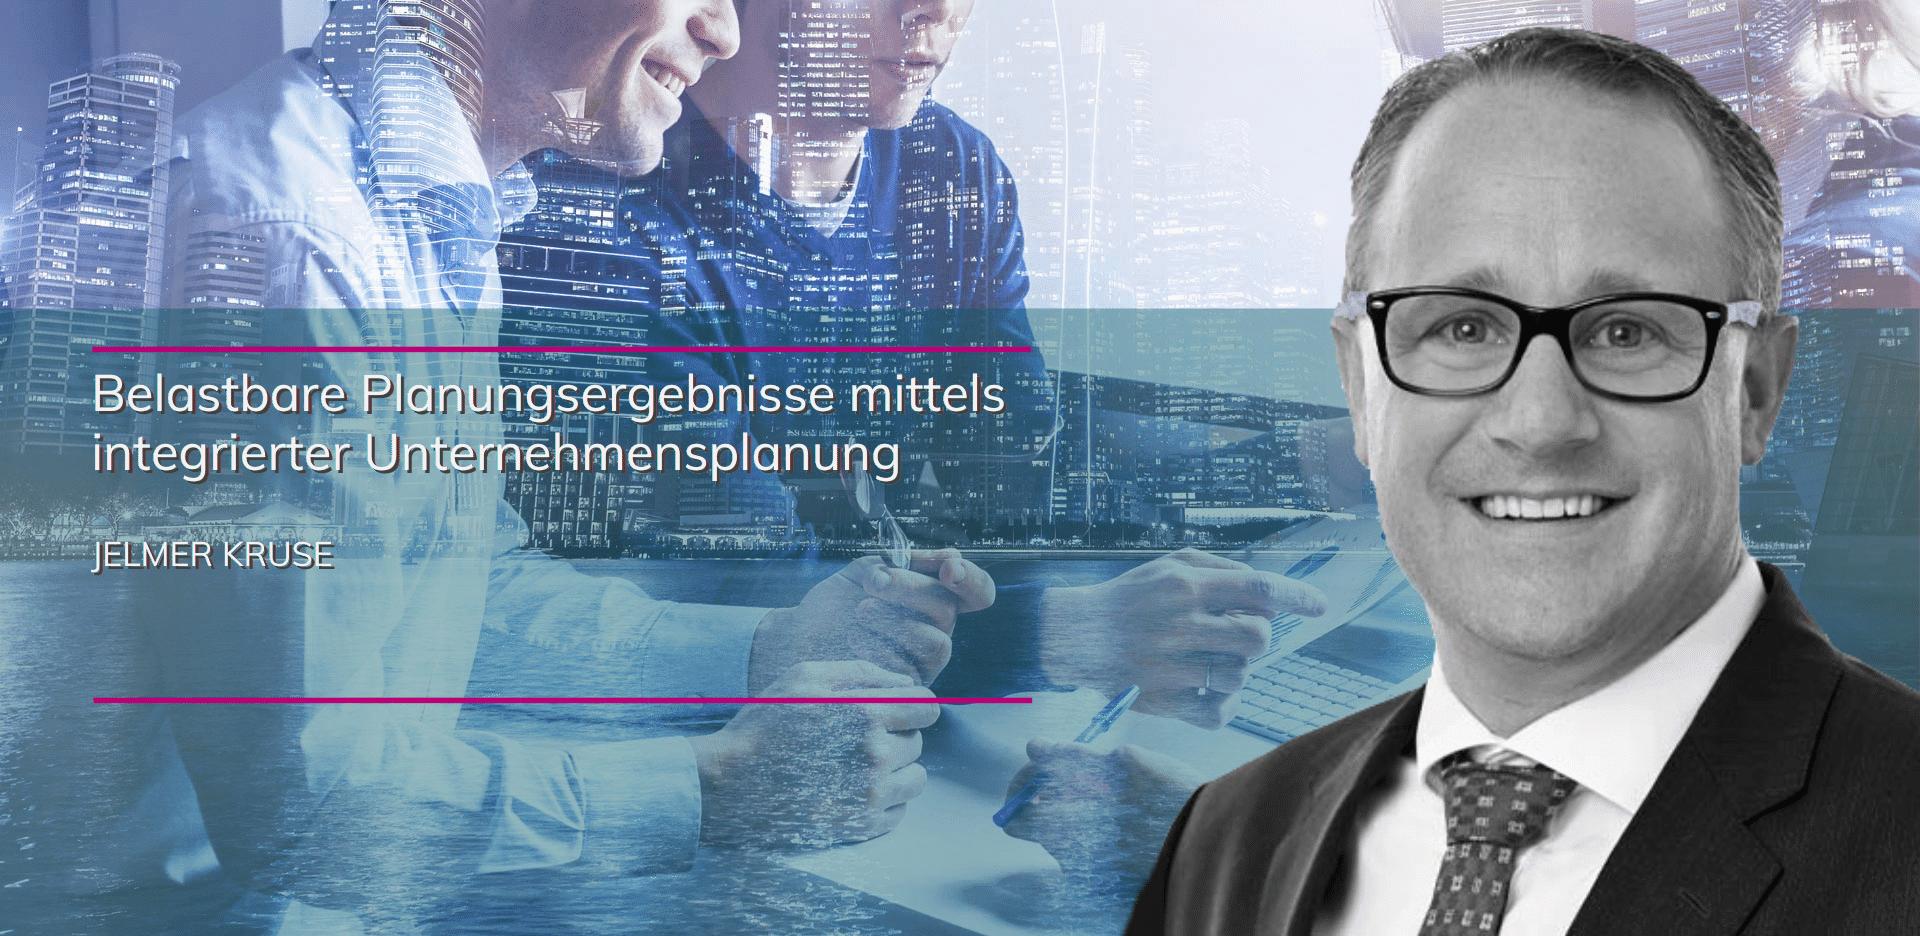 Jelmer Kruse - Belastbare Planungsergebnisse mittels integrierter Unternehmensplanung